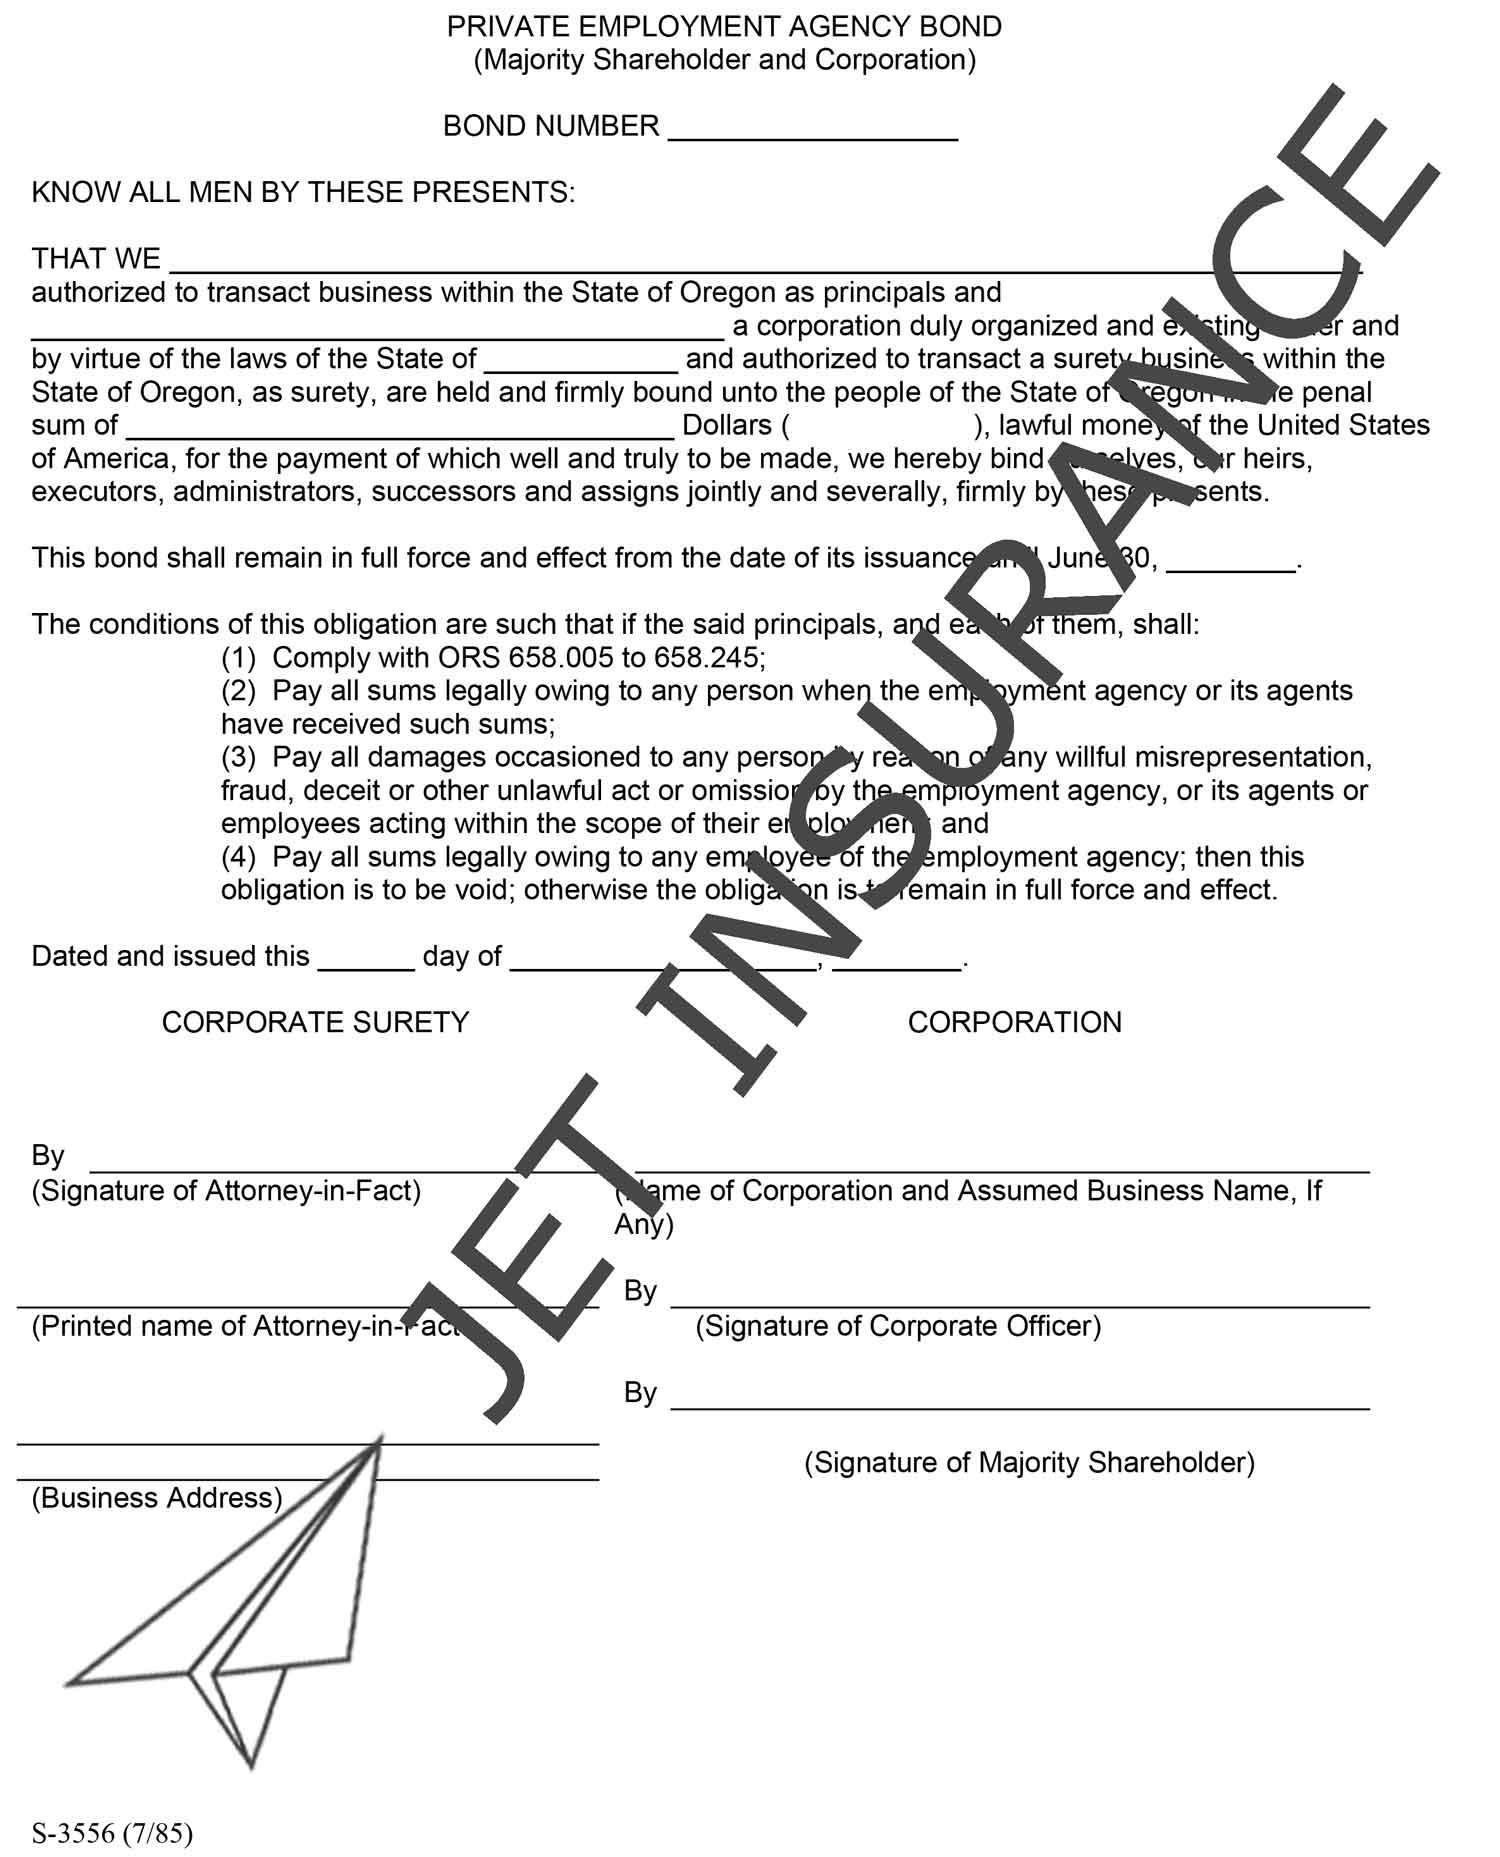 Oregon Private Employment Agency Bond Form